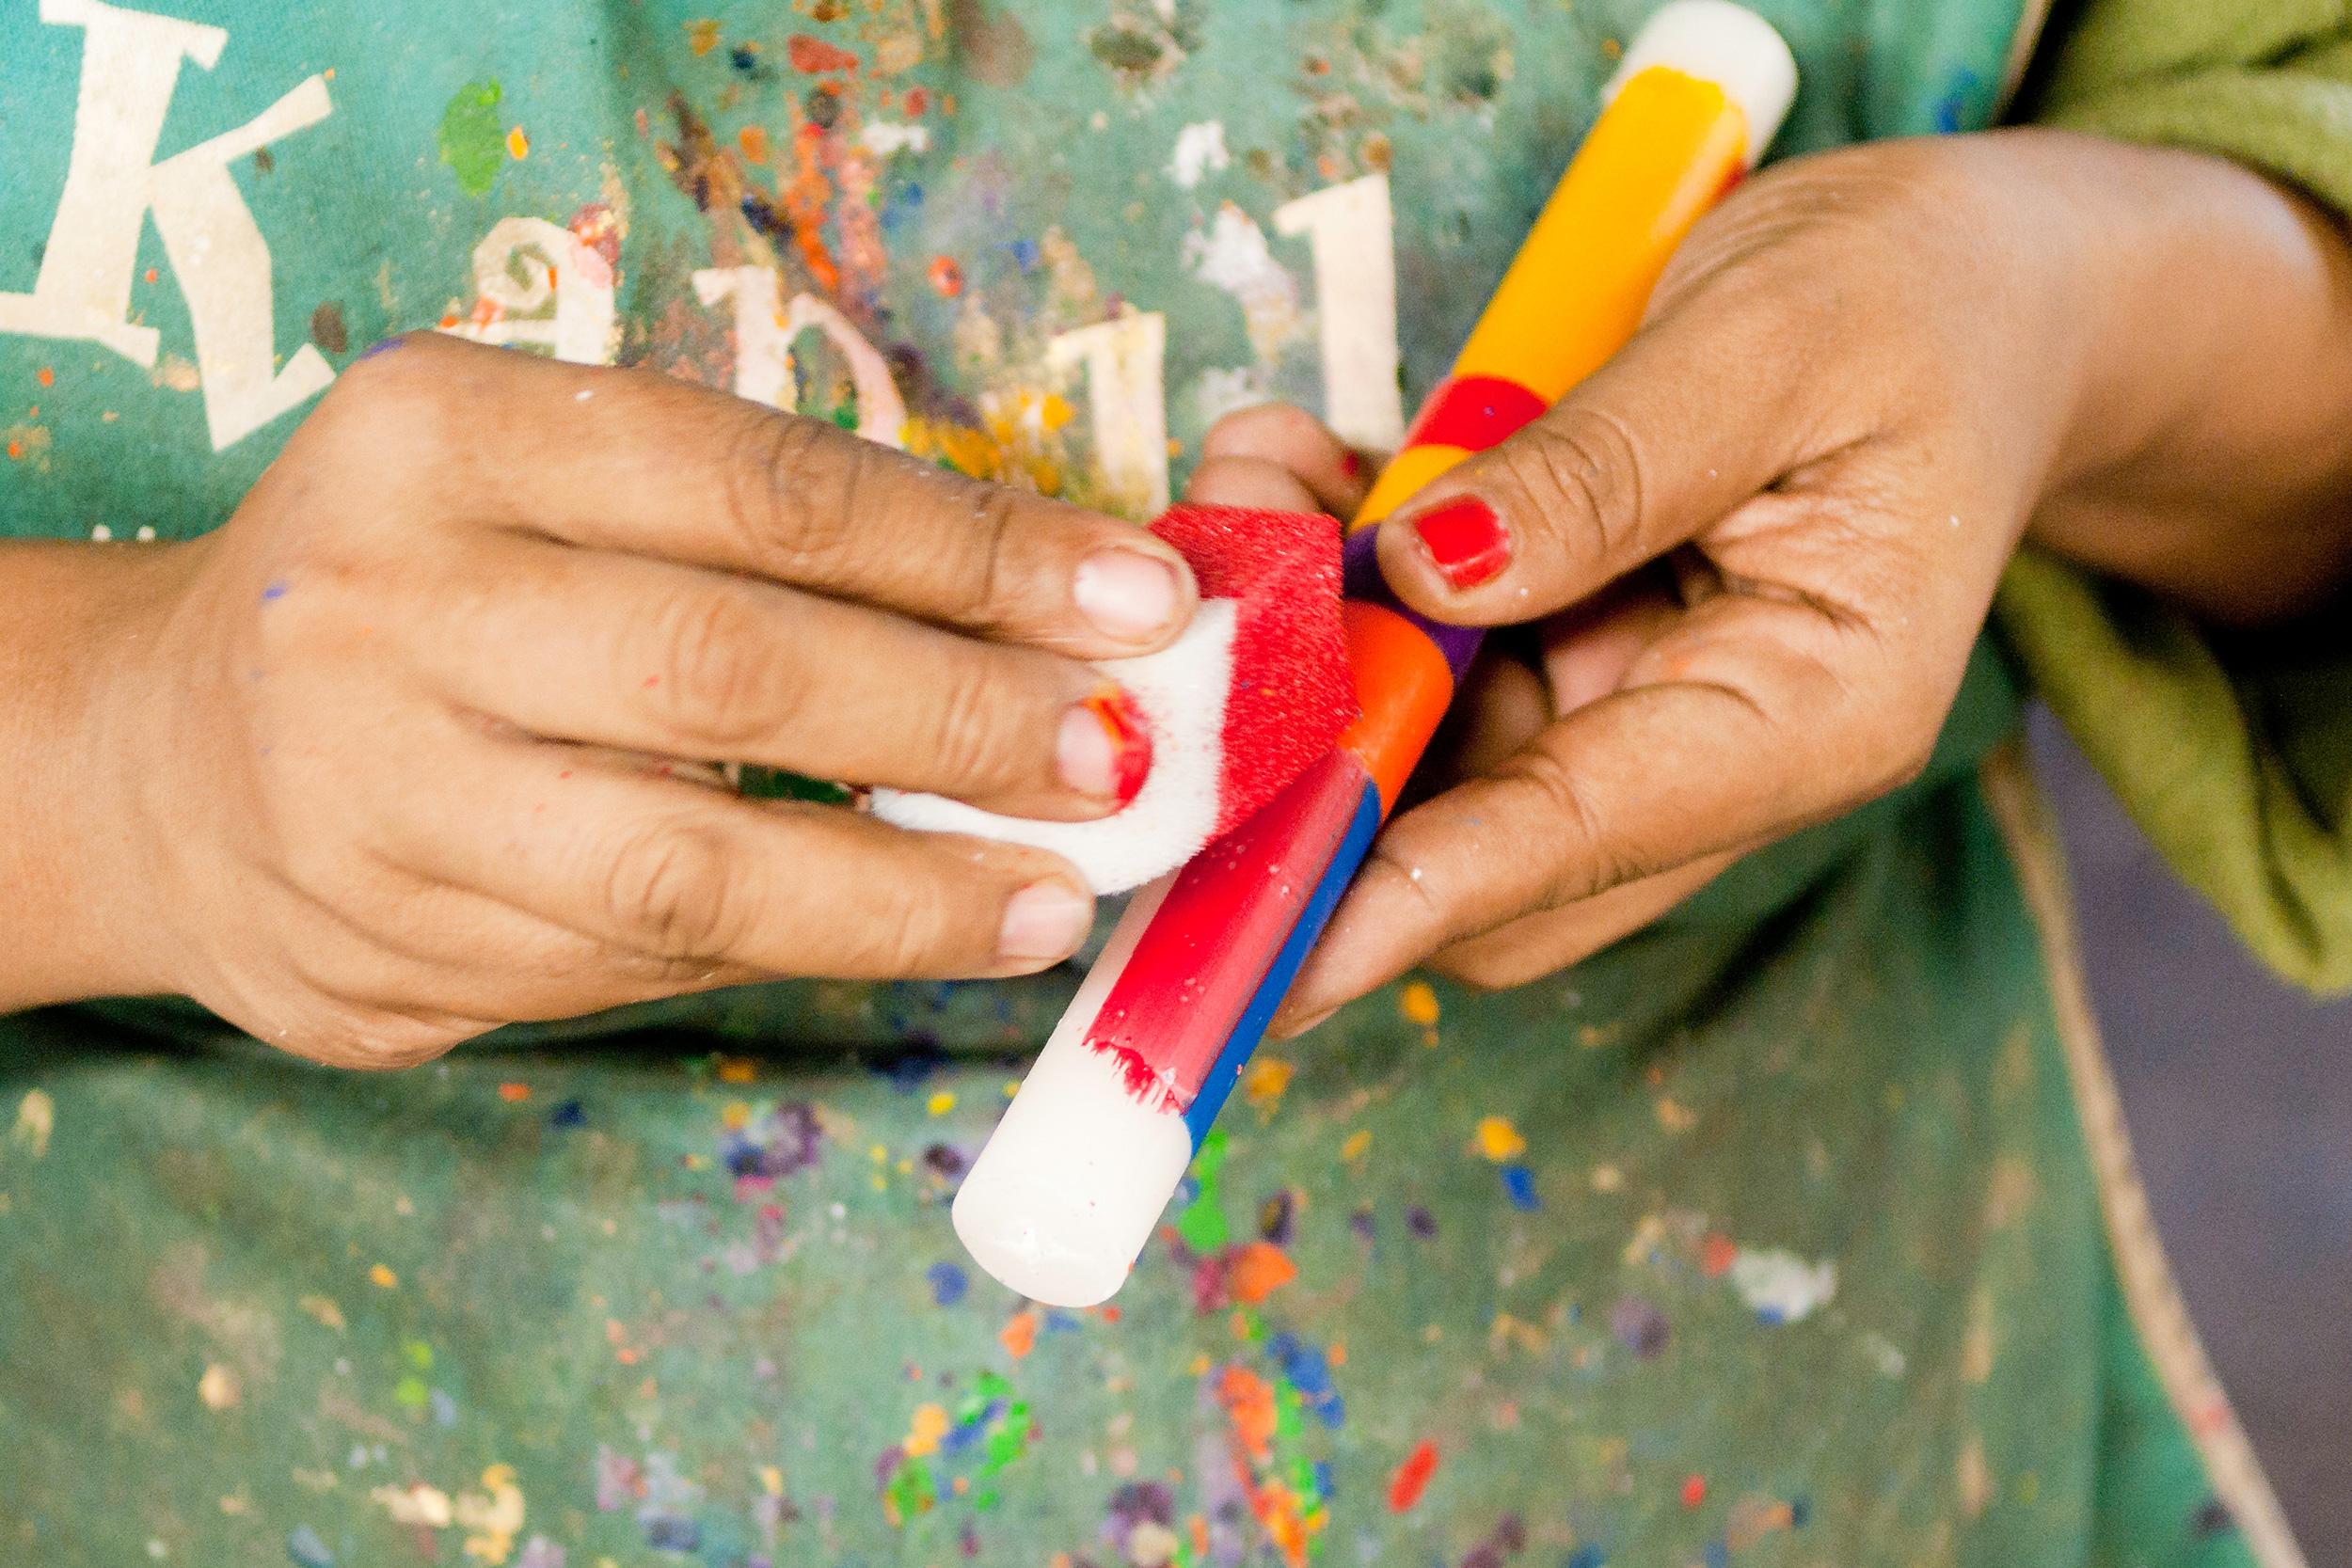 kapula-handmade-hand-paint-dinner-candle-sponge.jpg